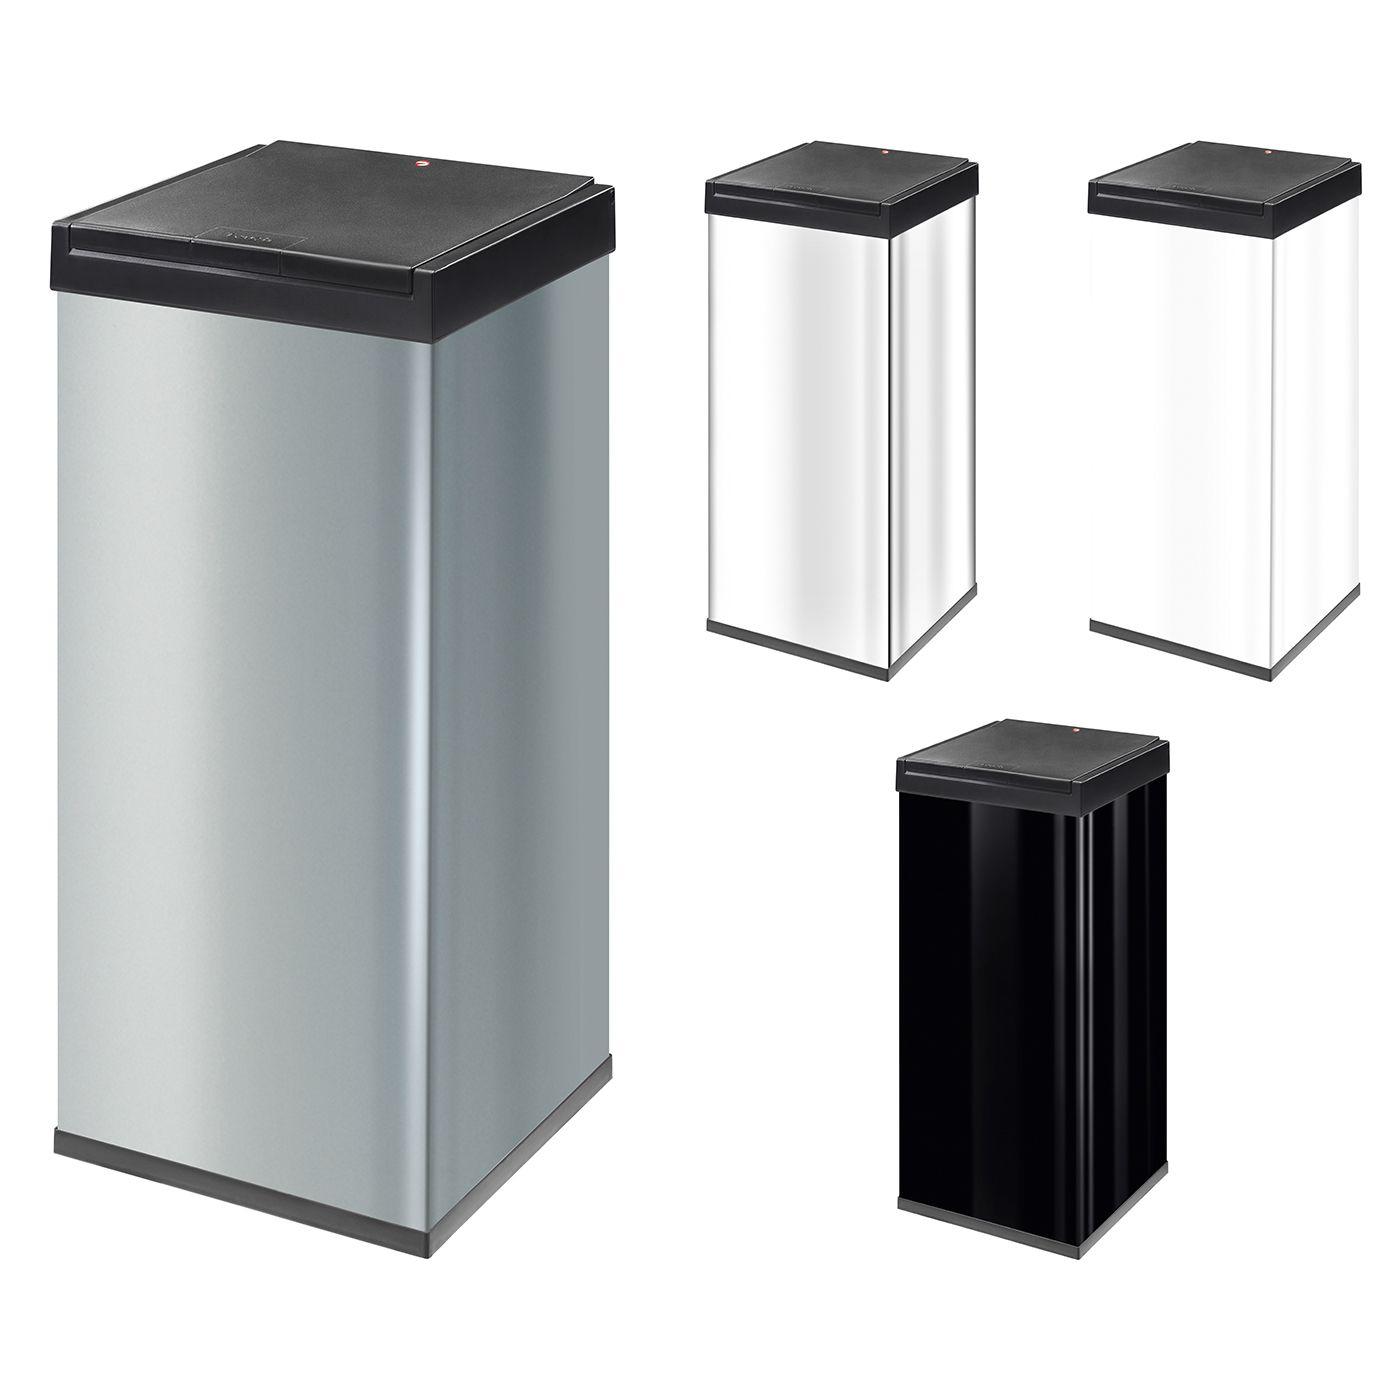 Hailo Big Box 80 L Grossraum Abfallbox Touchdeckel Mulleimer Abfallsammler Neu Abfallsammler Eimer Box